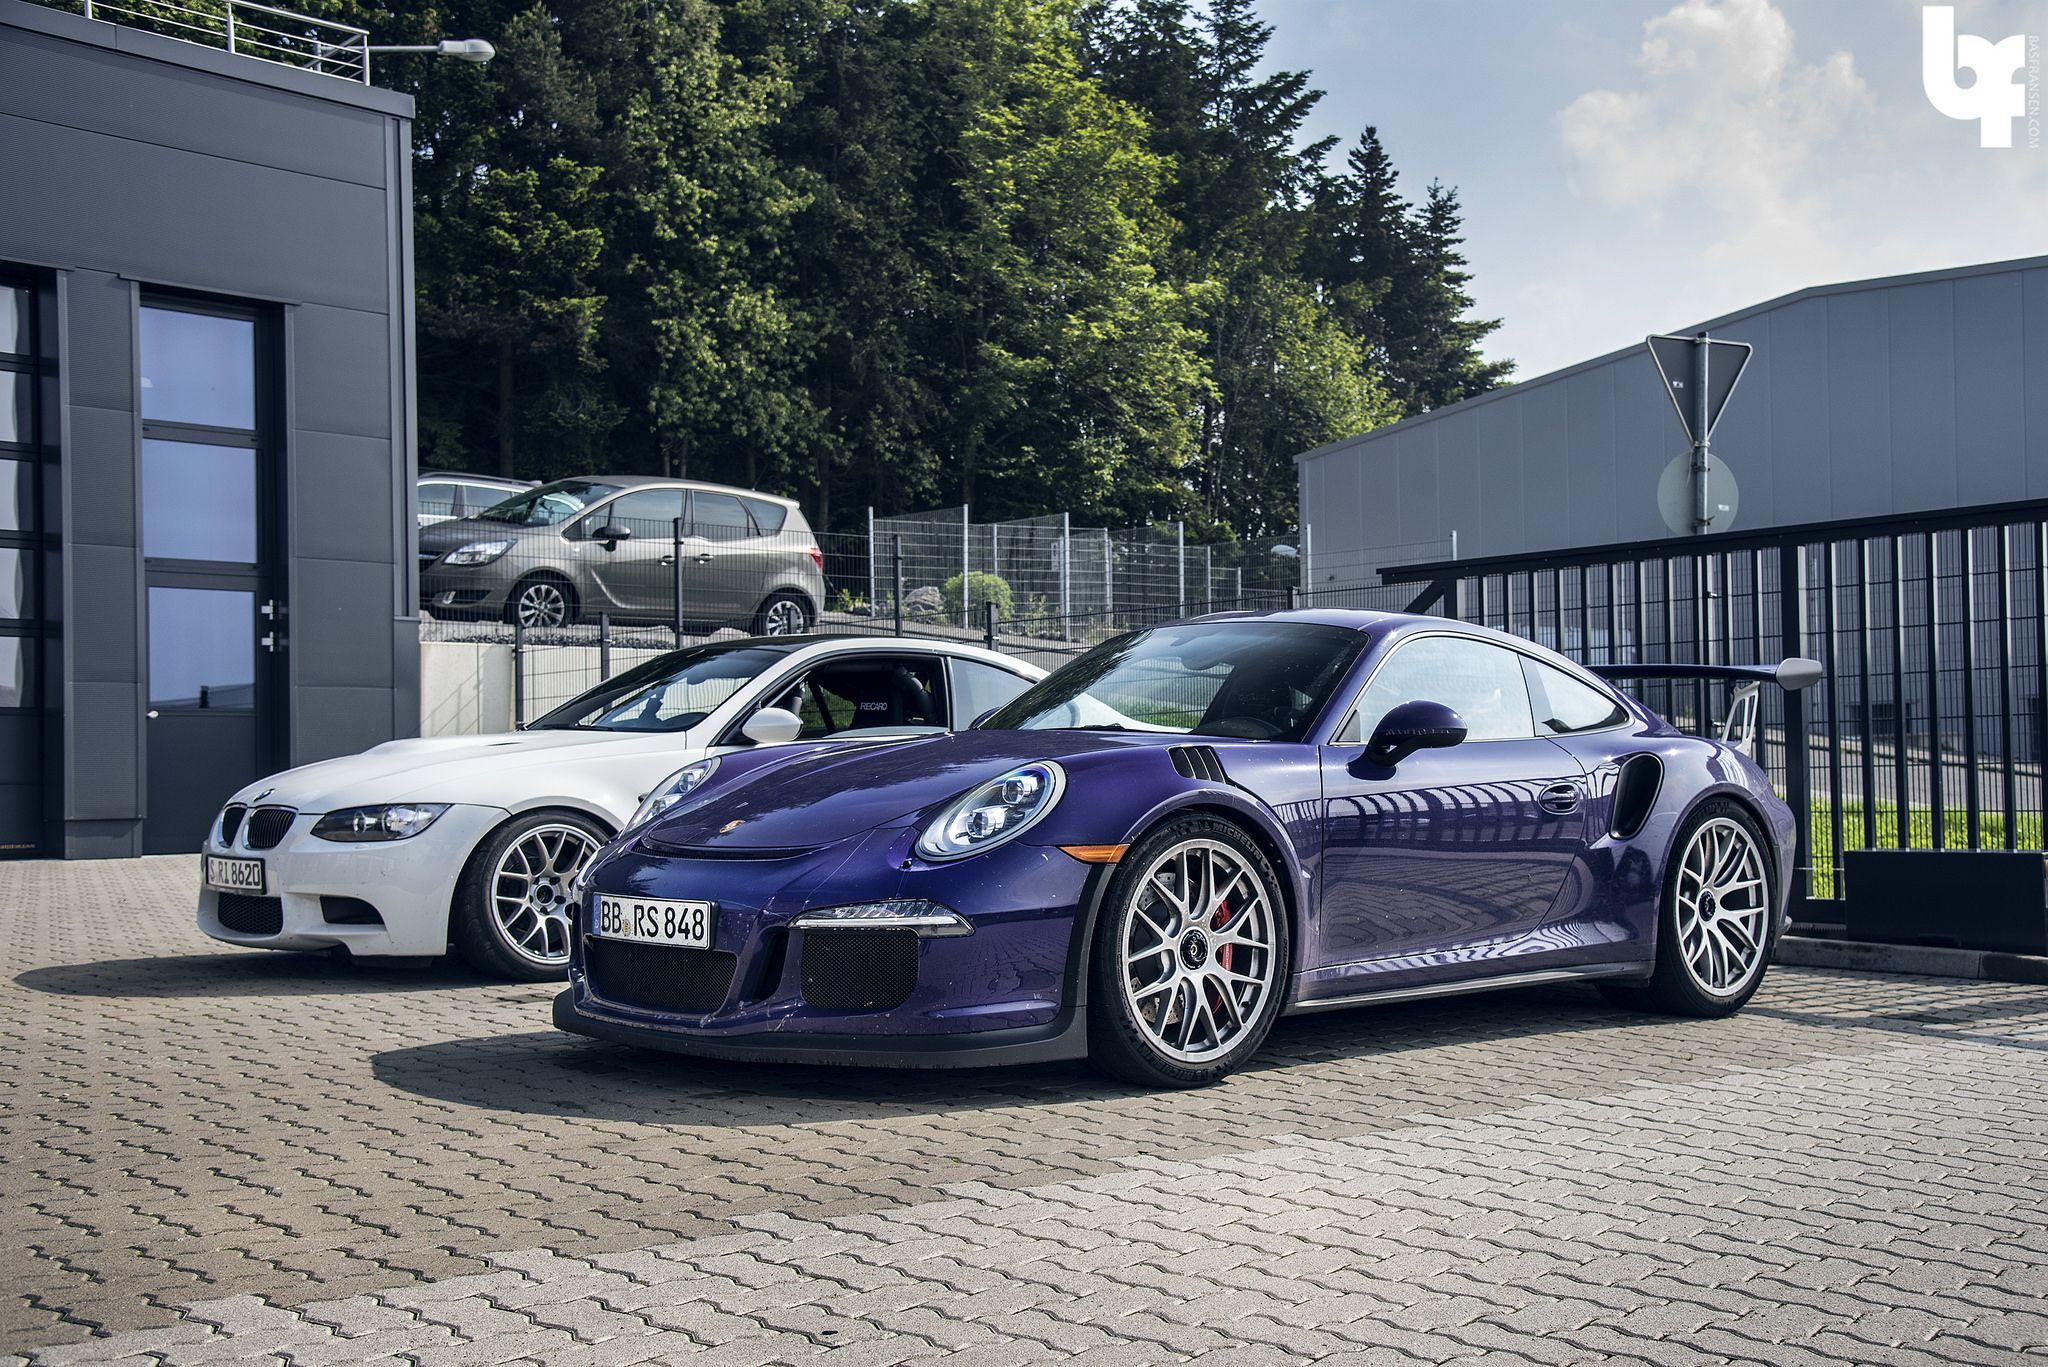 https://flic.kr/p/KbAqu2 | Porsche GT3 RS | Become a fan on Facebook Check out…